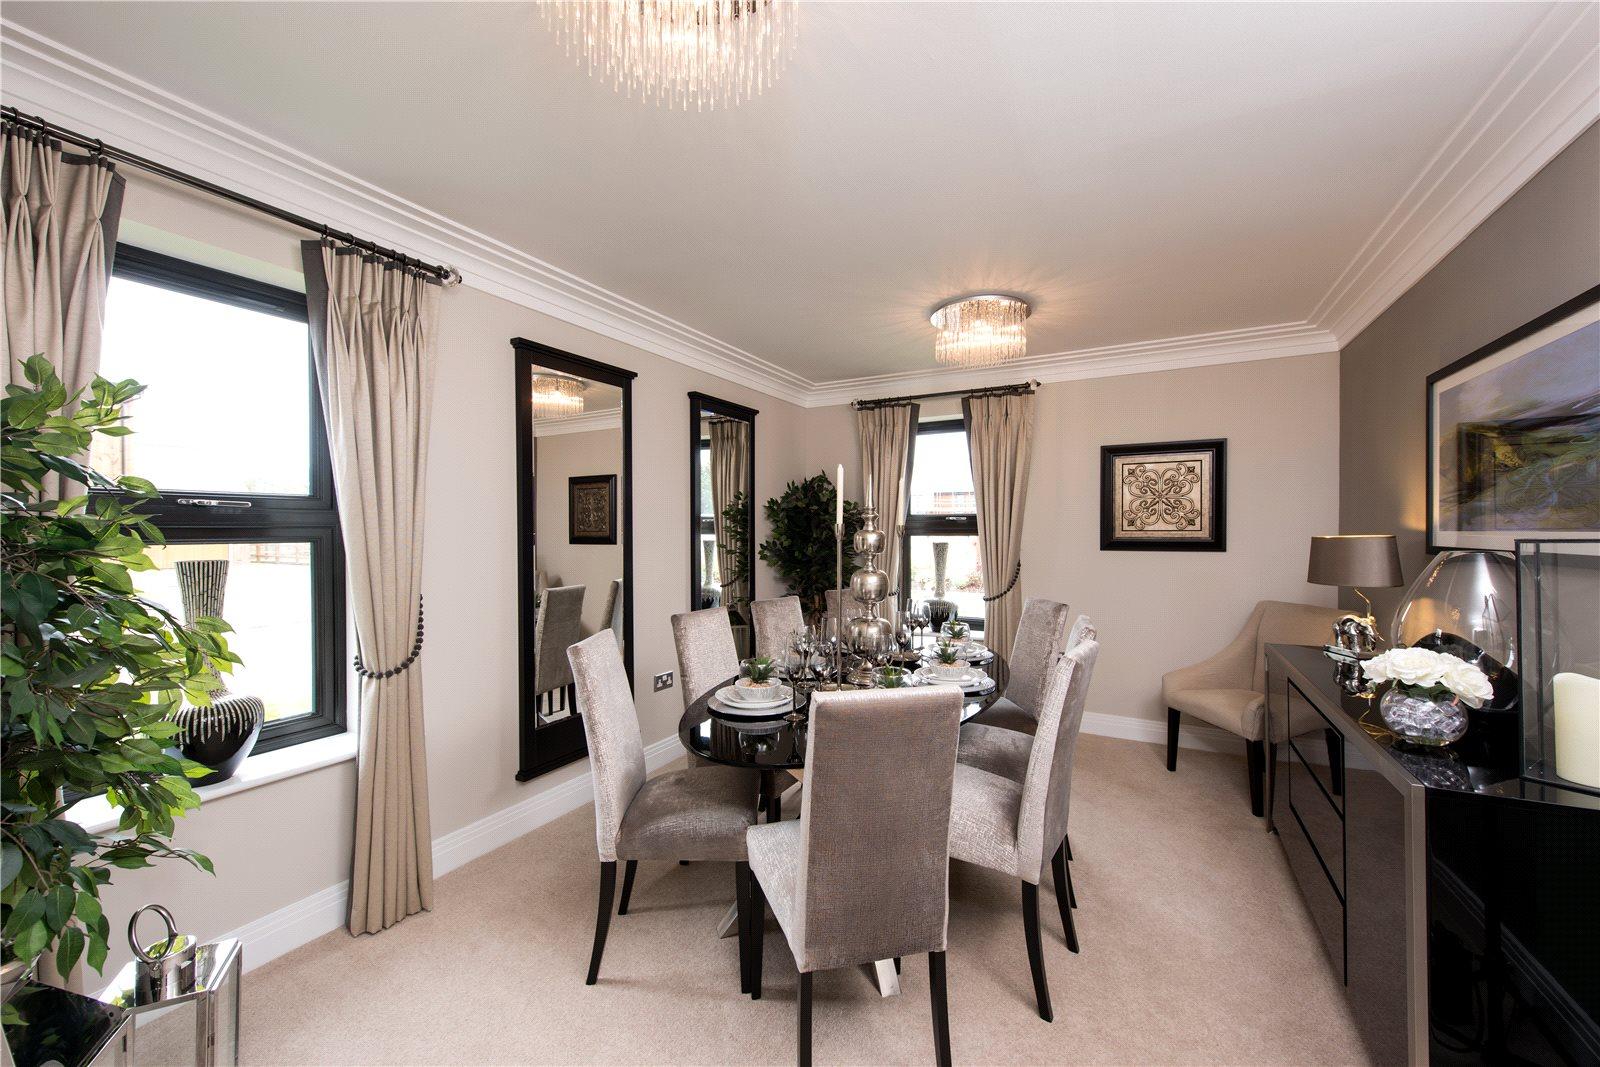 Additional photo for property listing at Station Road, Ashwell, Baldock, Hertfordshire, SG7 Baldock, England